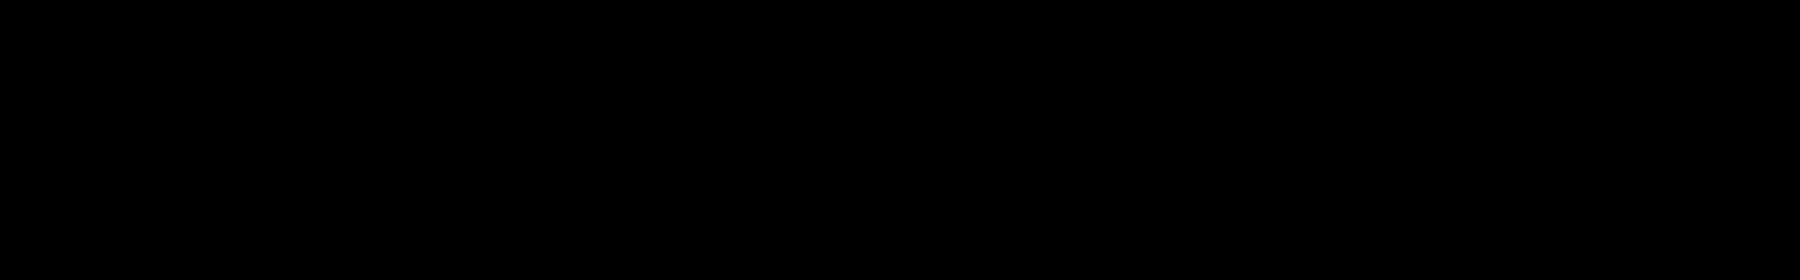 Acapella Vocals Bundle audio waveform